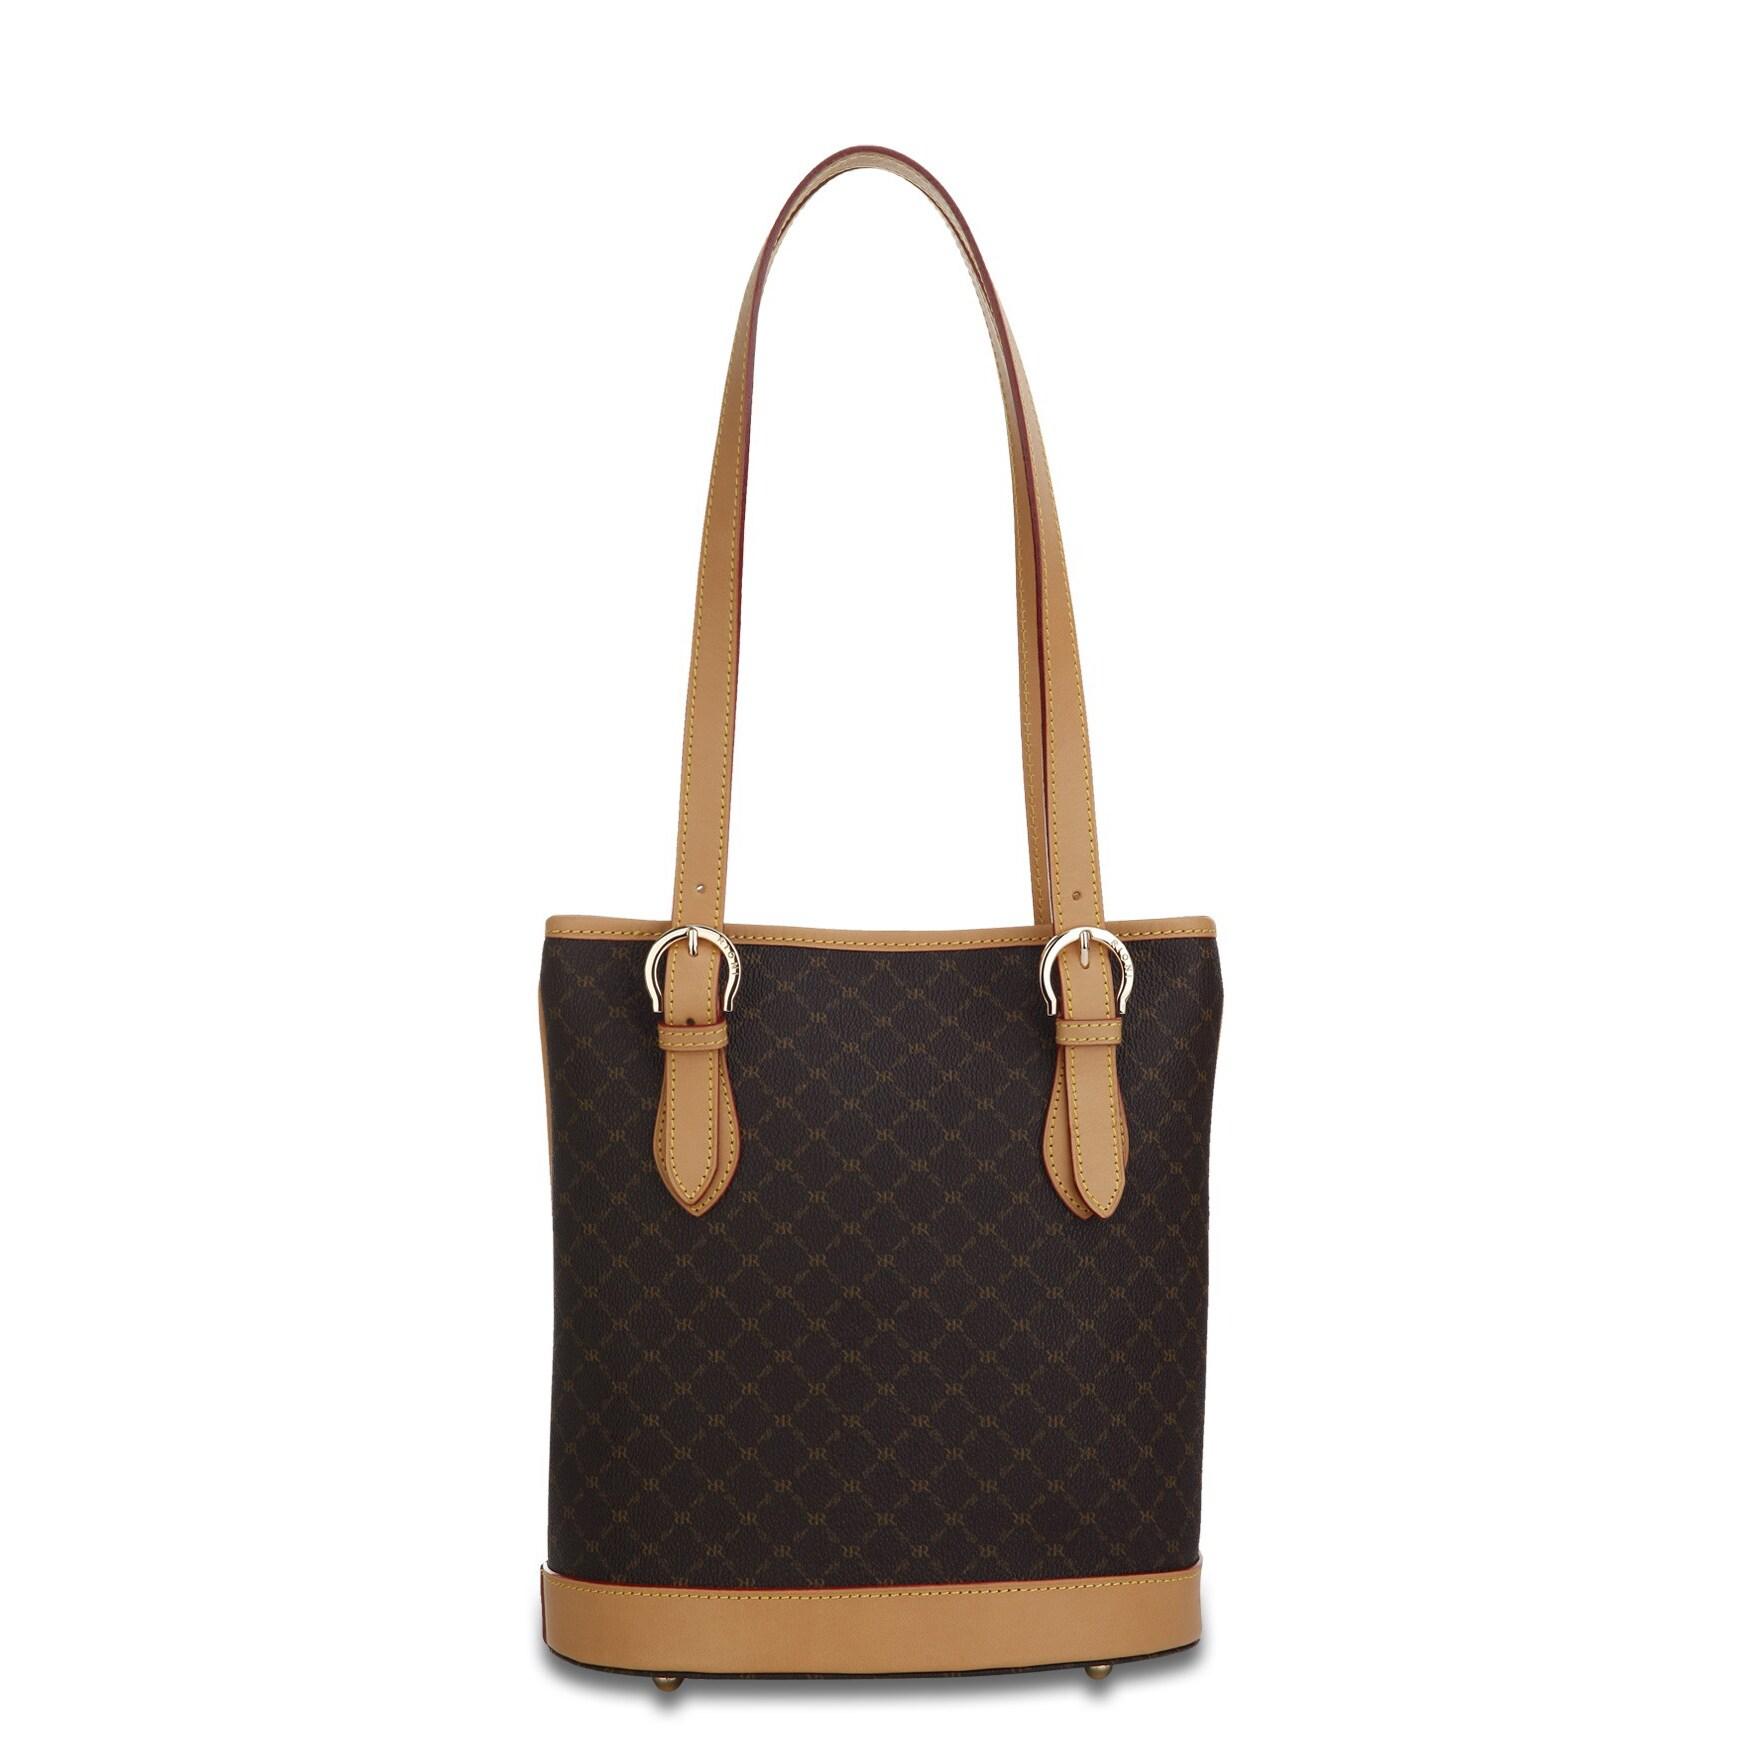 Shop Rioni Signature Brown Shoulder Bucket Handbag - Free Shipping Today -  Overstock.com - 3255088 8c0b5a1a48